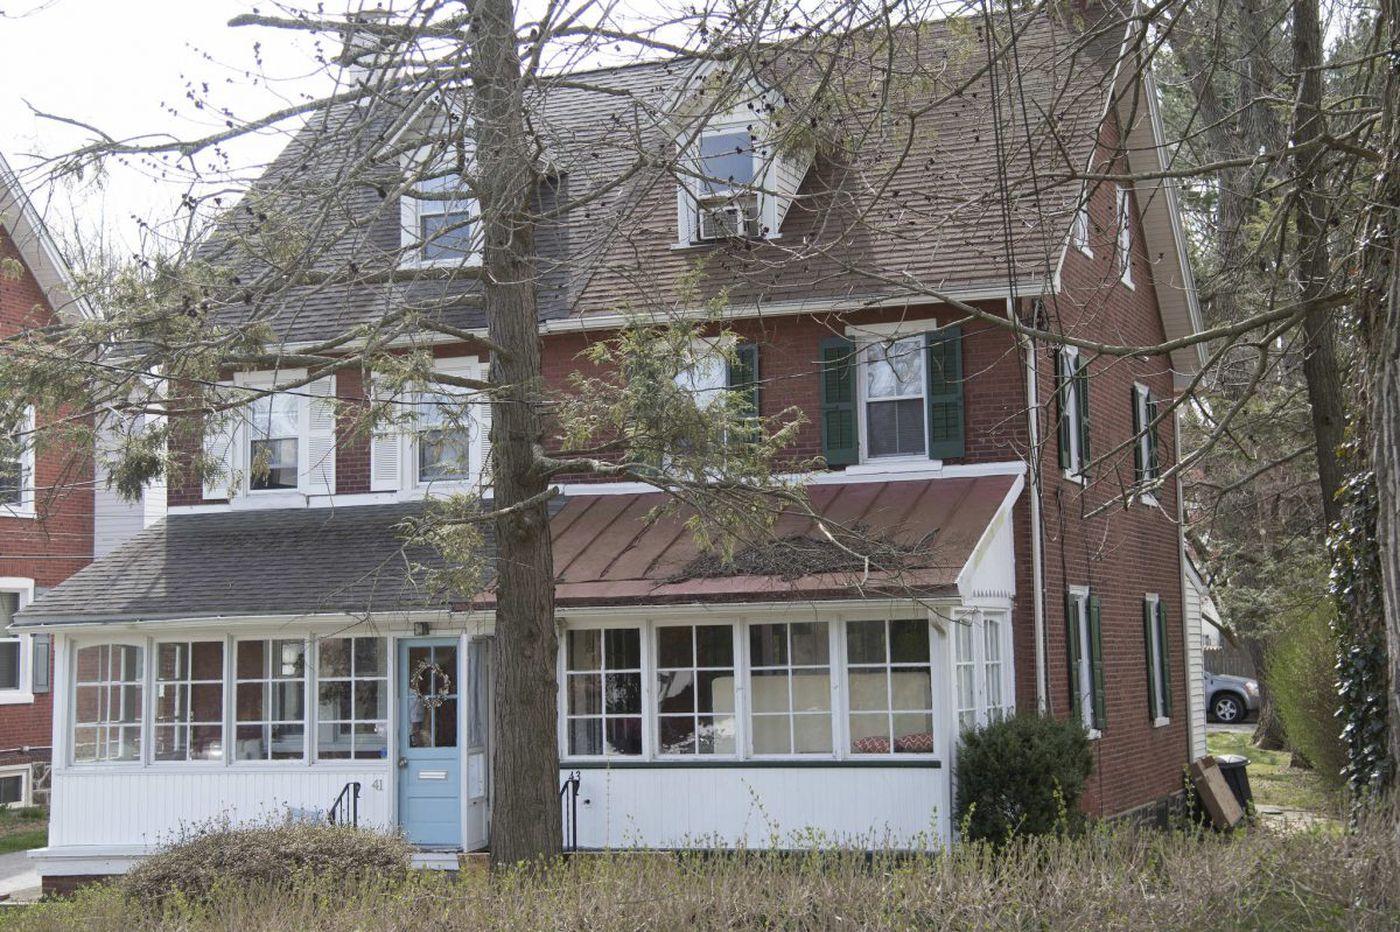 Two women dead in apparent murder-suicide in Radnor home